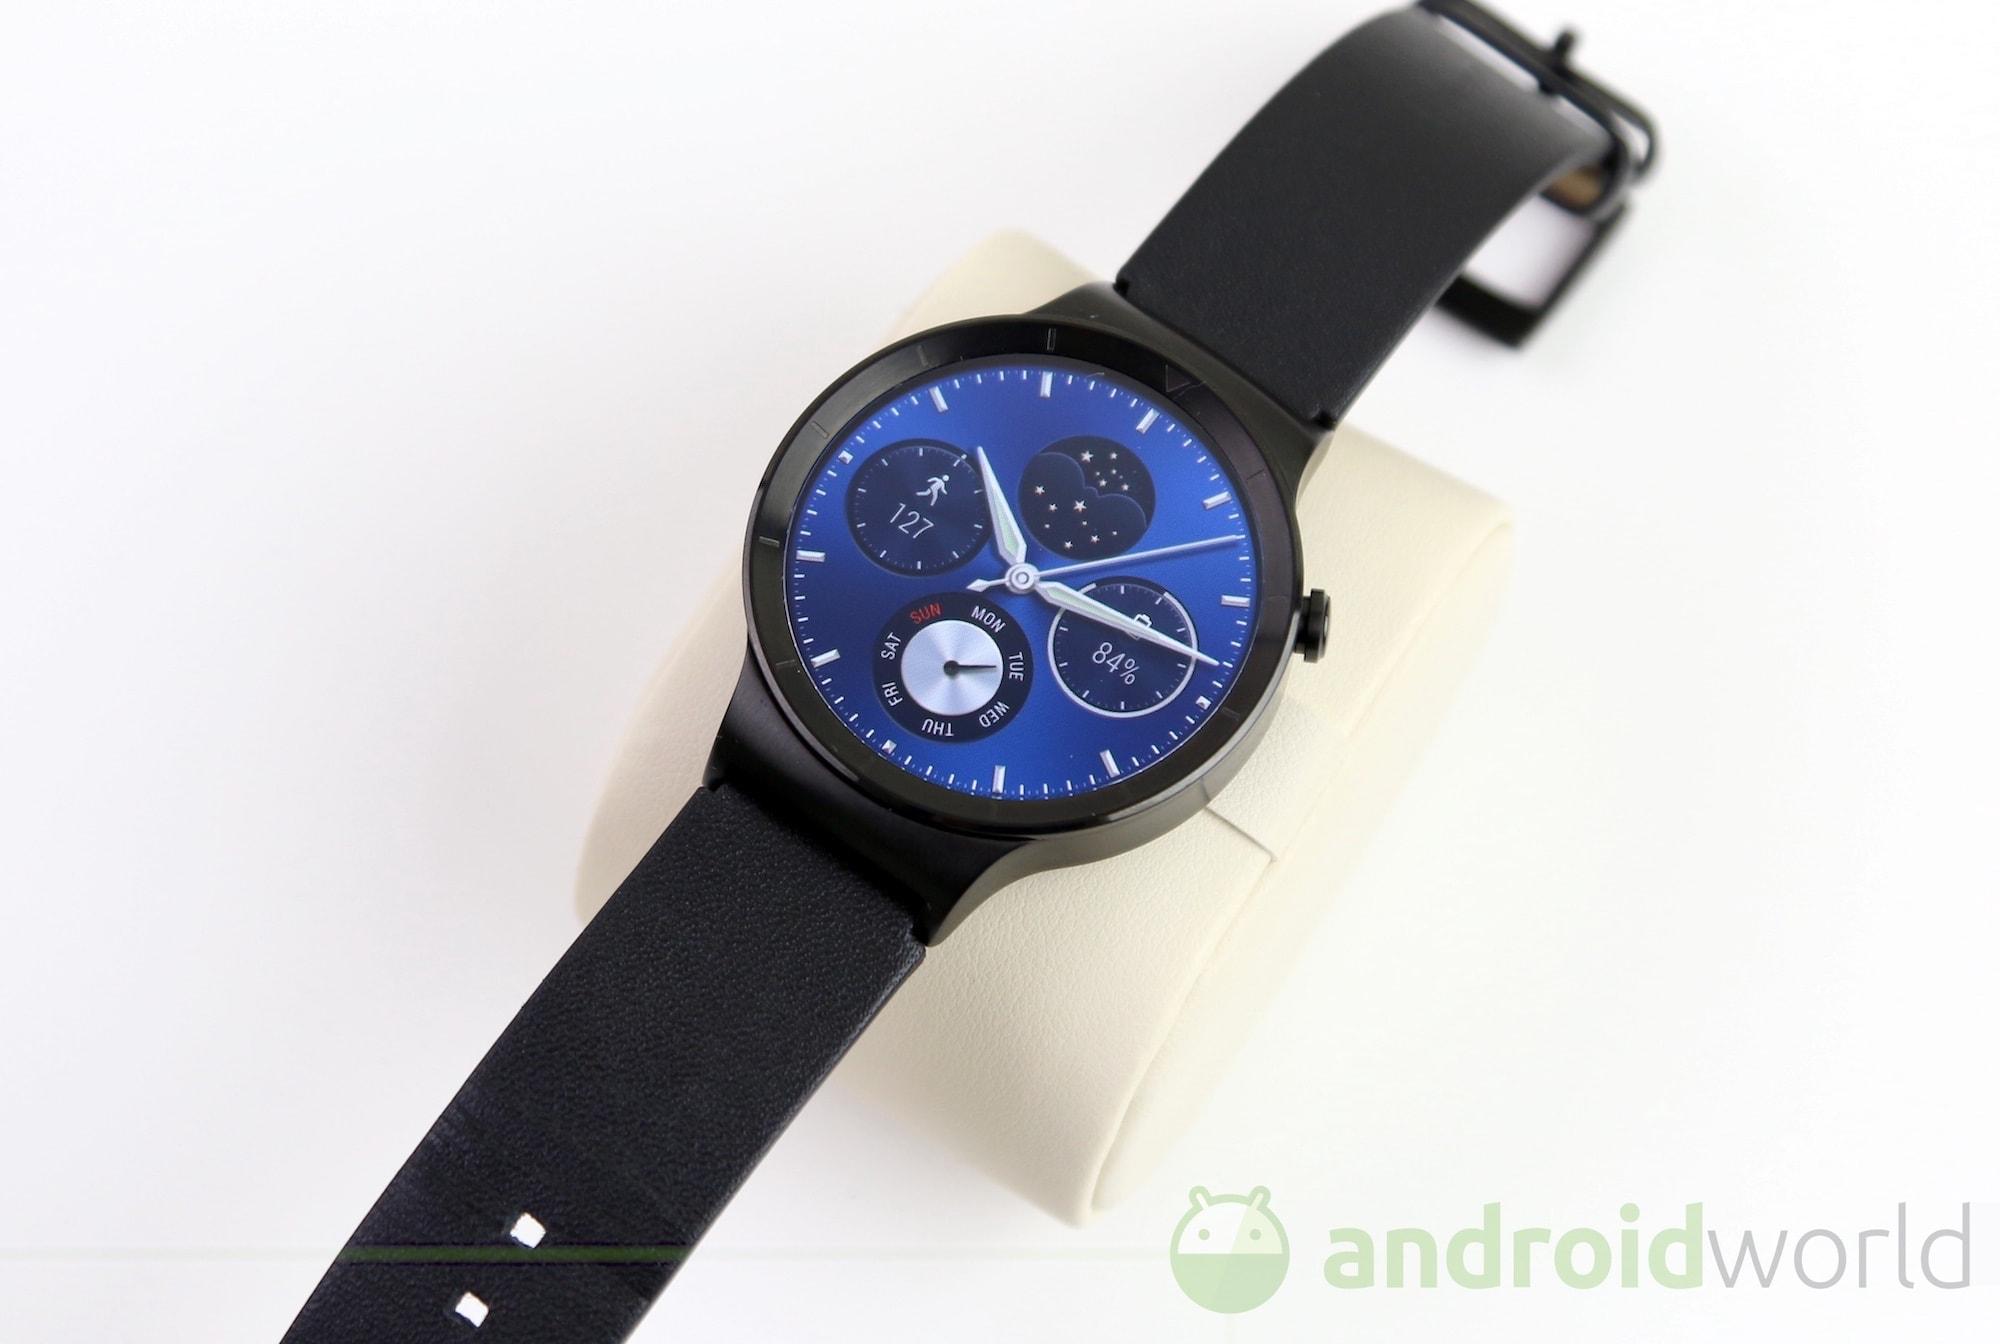 Sconto pari a 100 euro per Huawei Watch sul Google Store